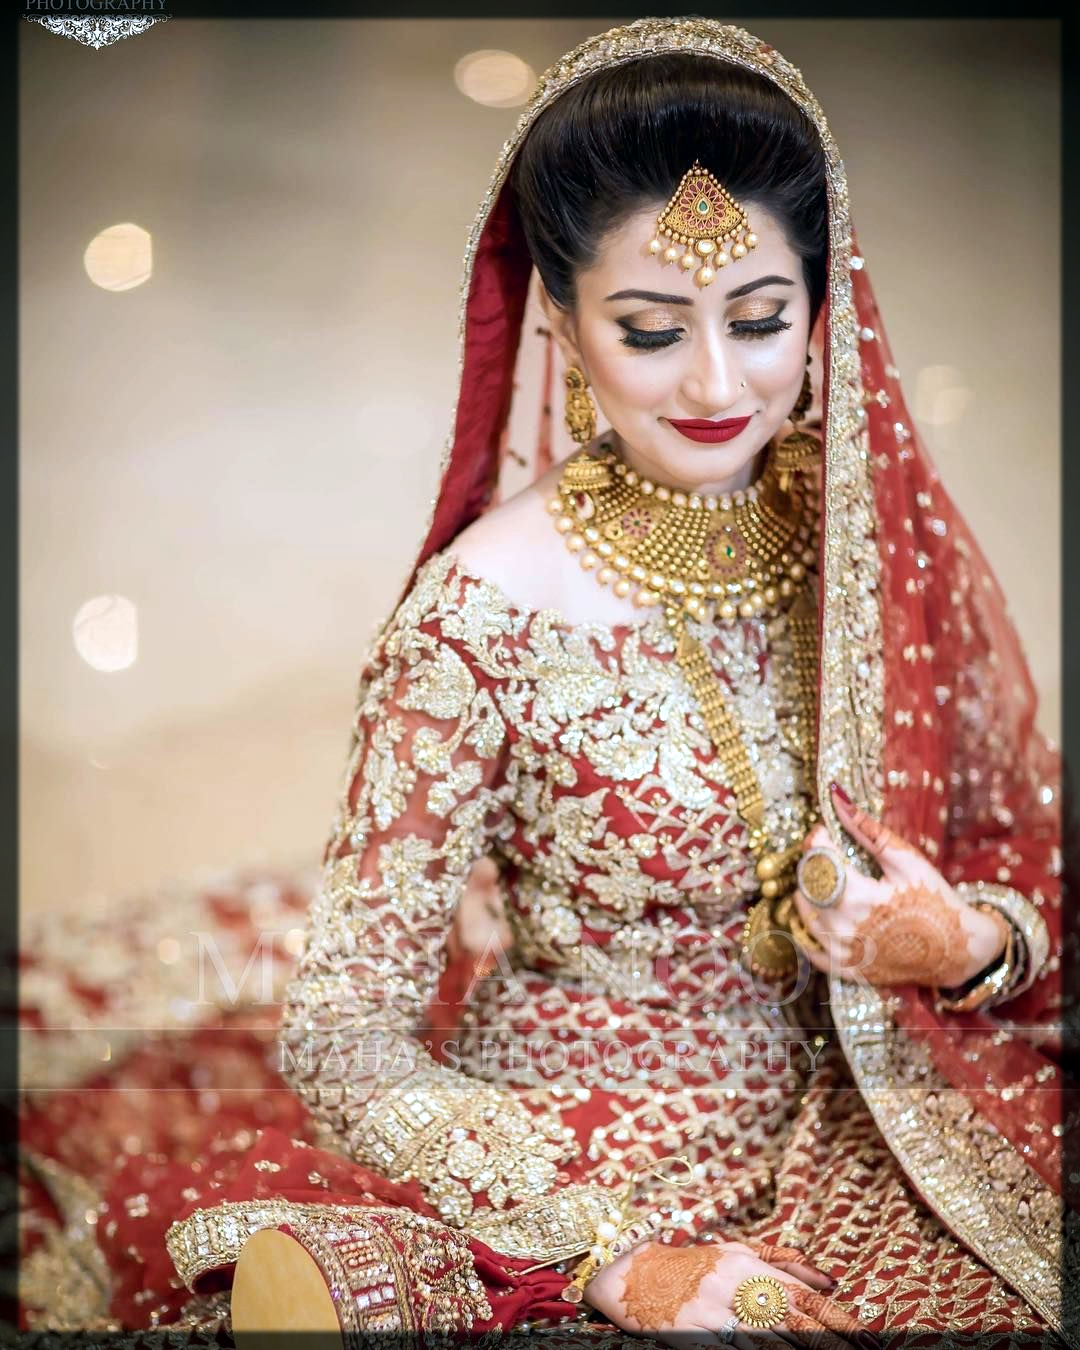 tradional red bridal makeup ideas